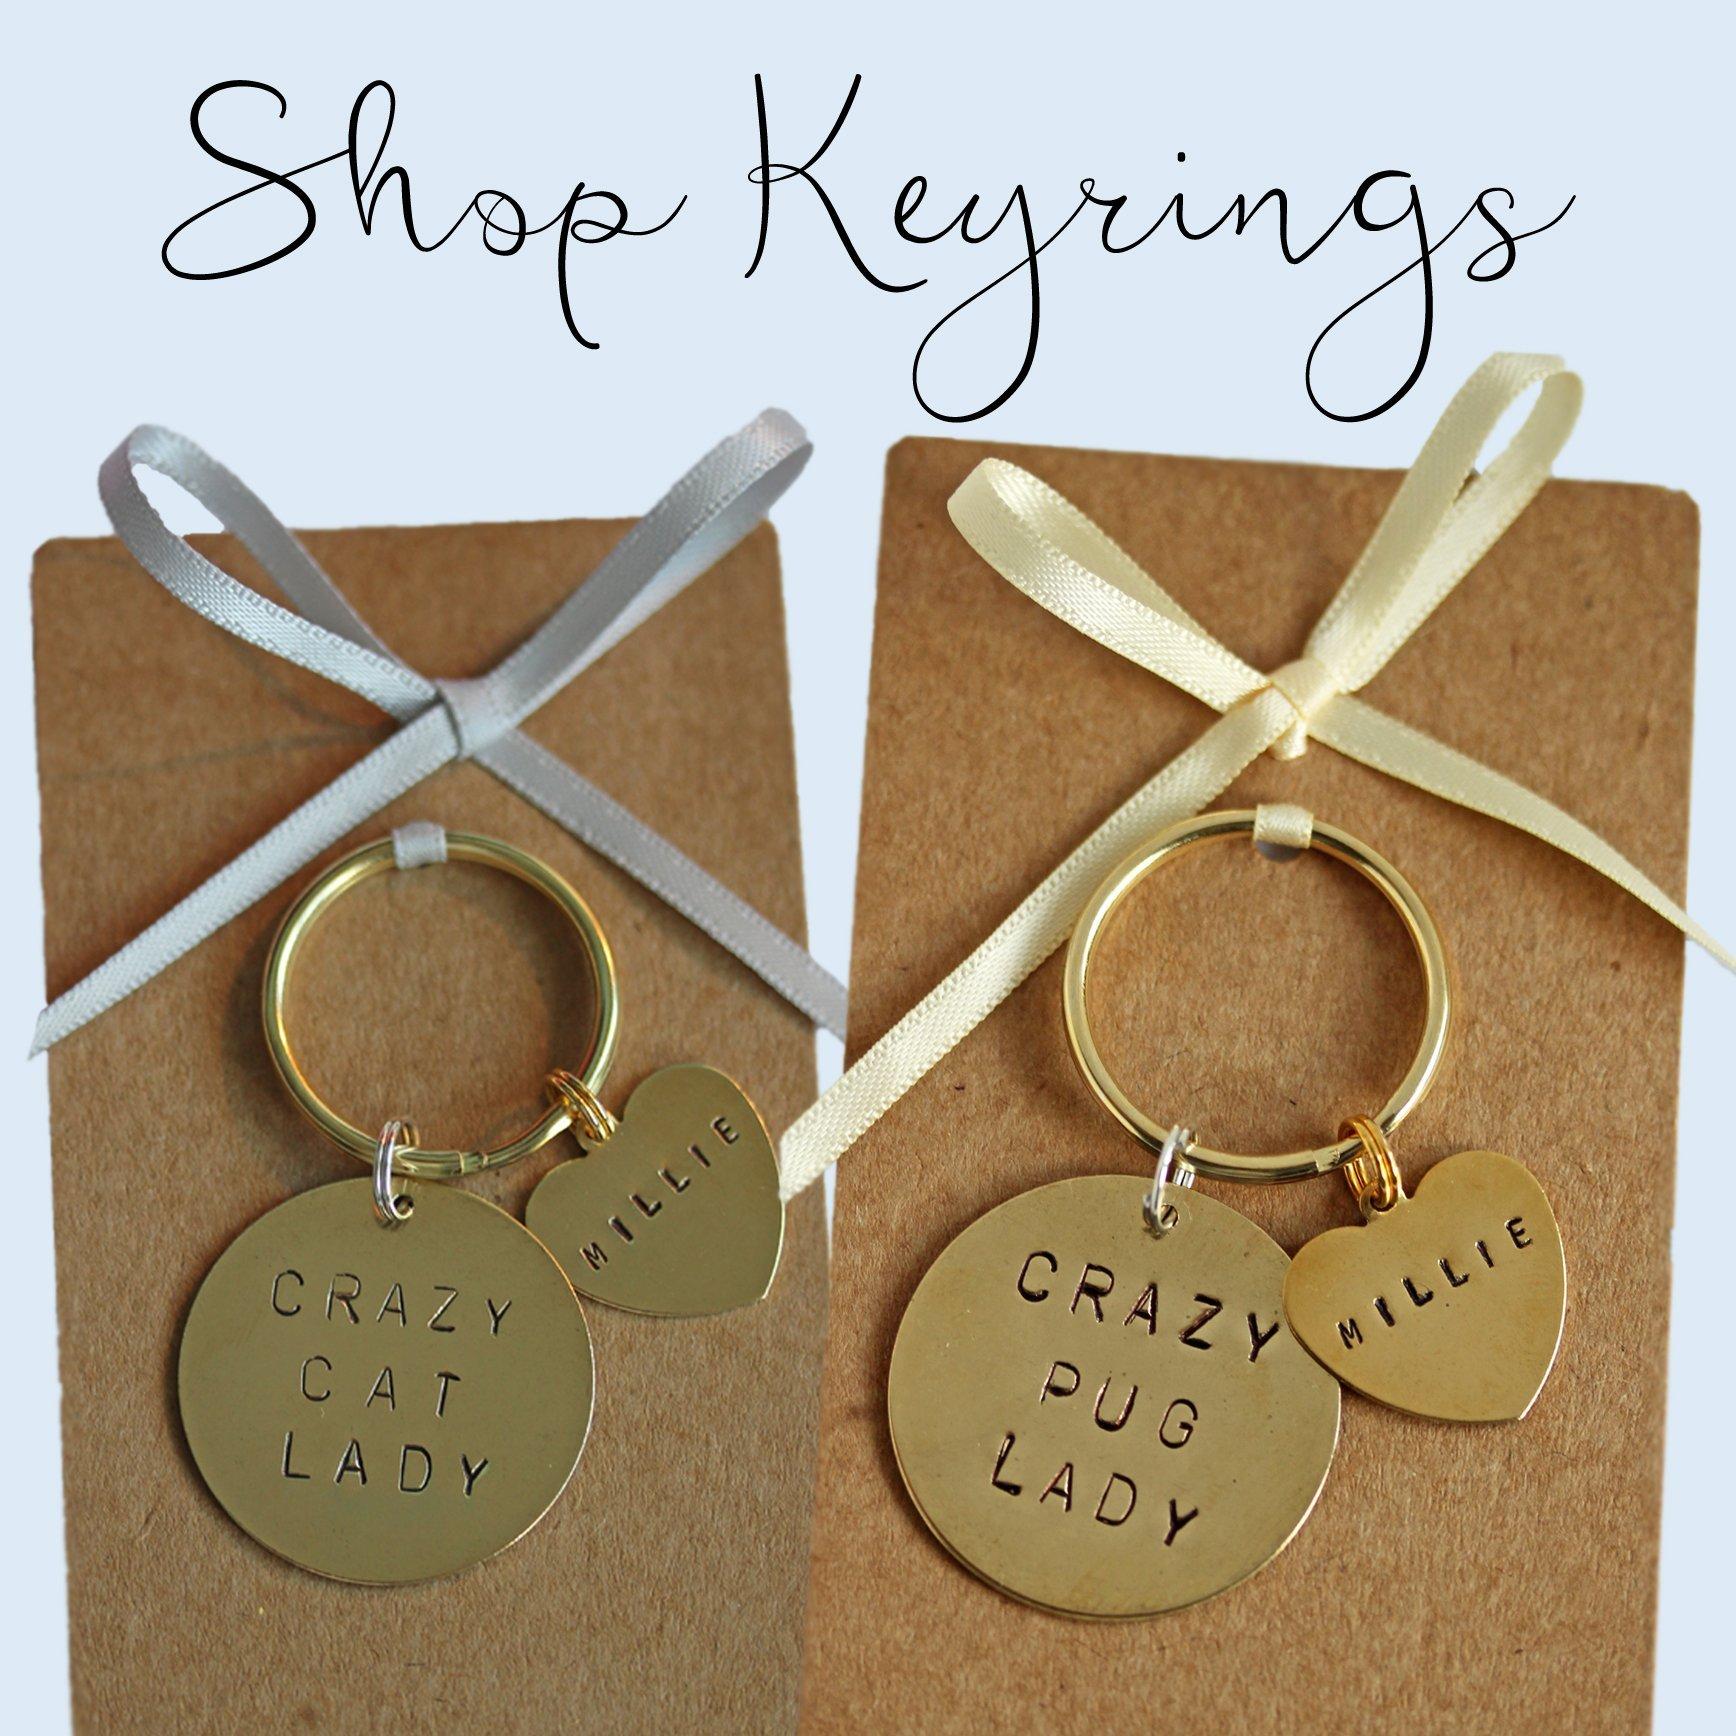 shop keyrings v2 copy